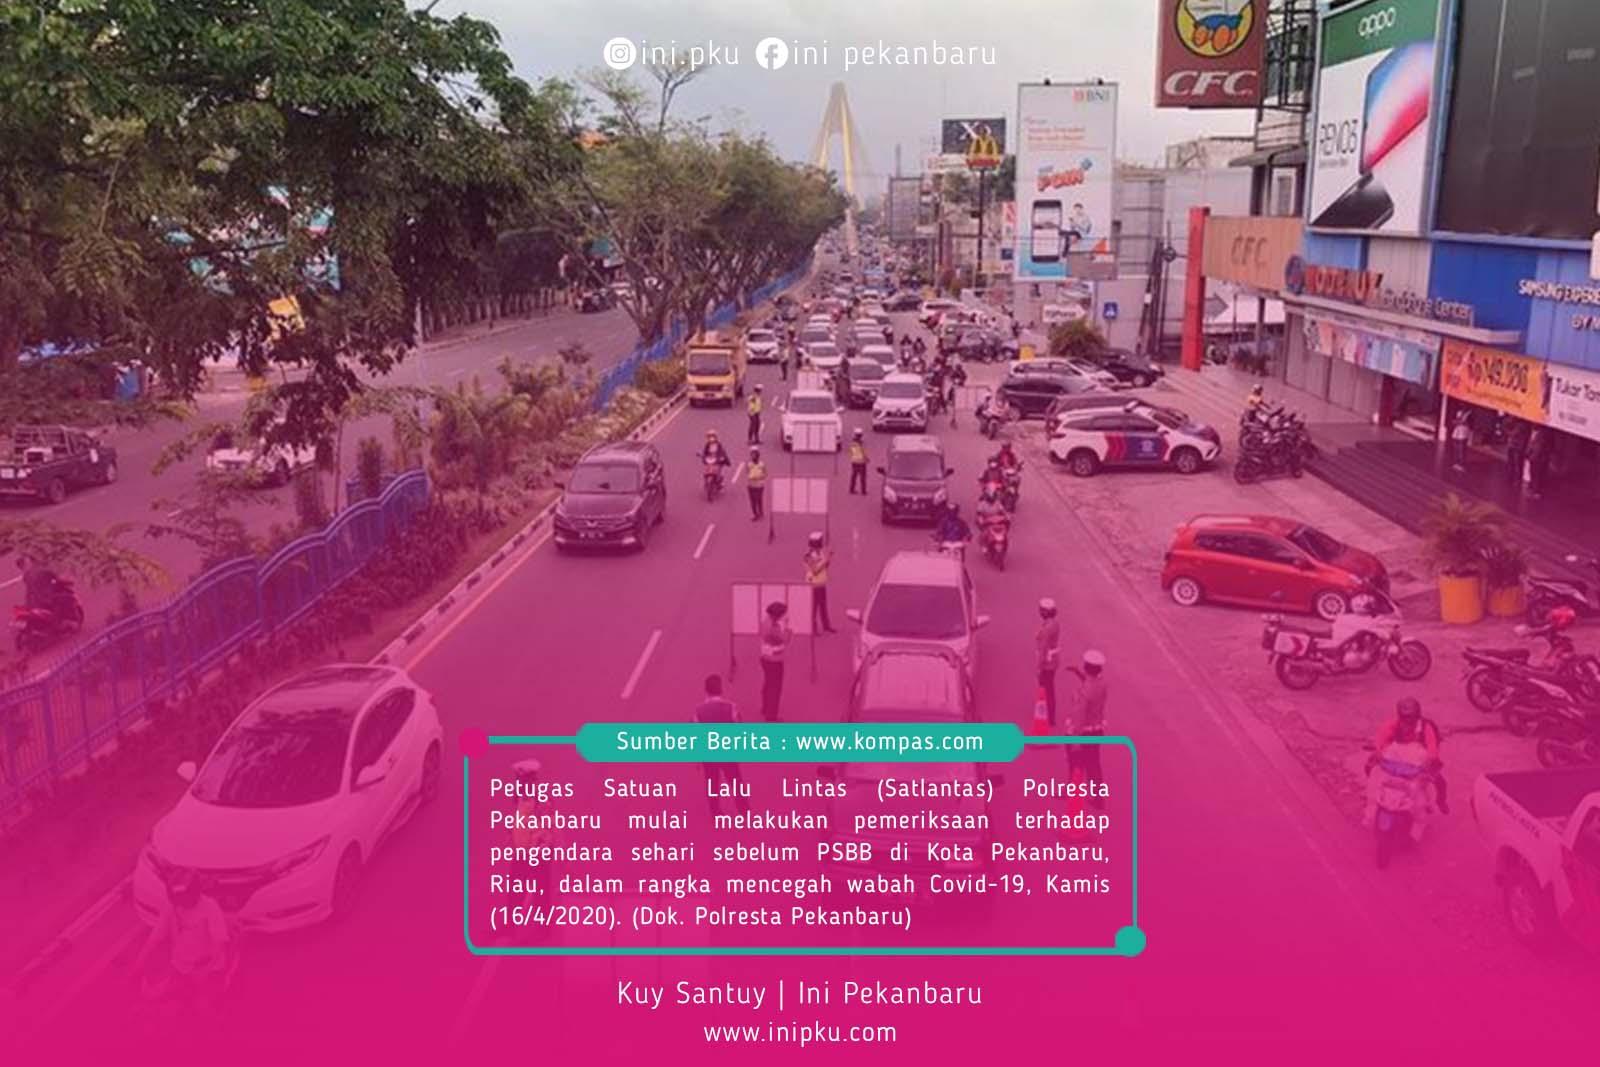 Petugas Satuan Lalu Lintas (Satlantas) Polresta Pekanbaru